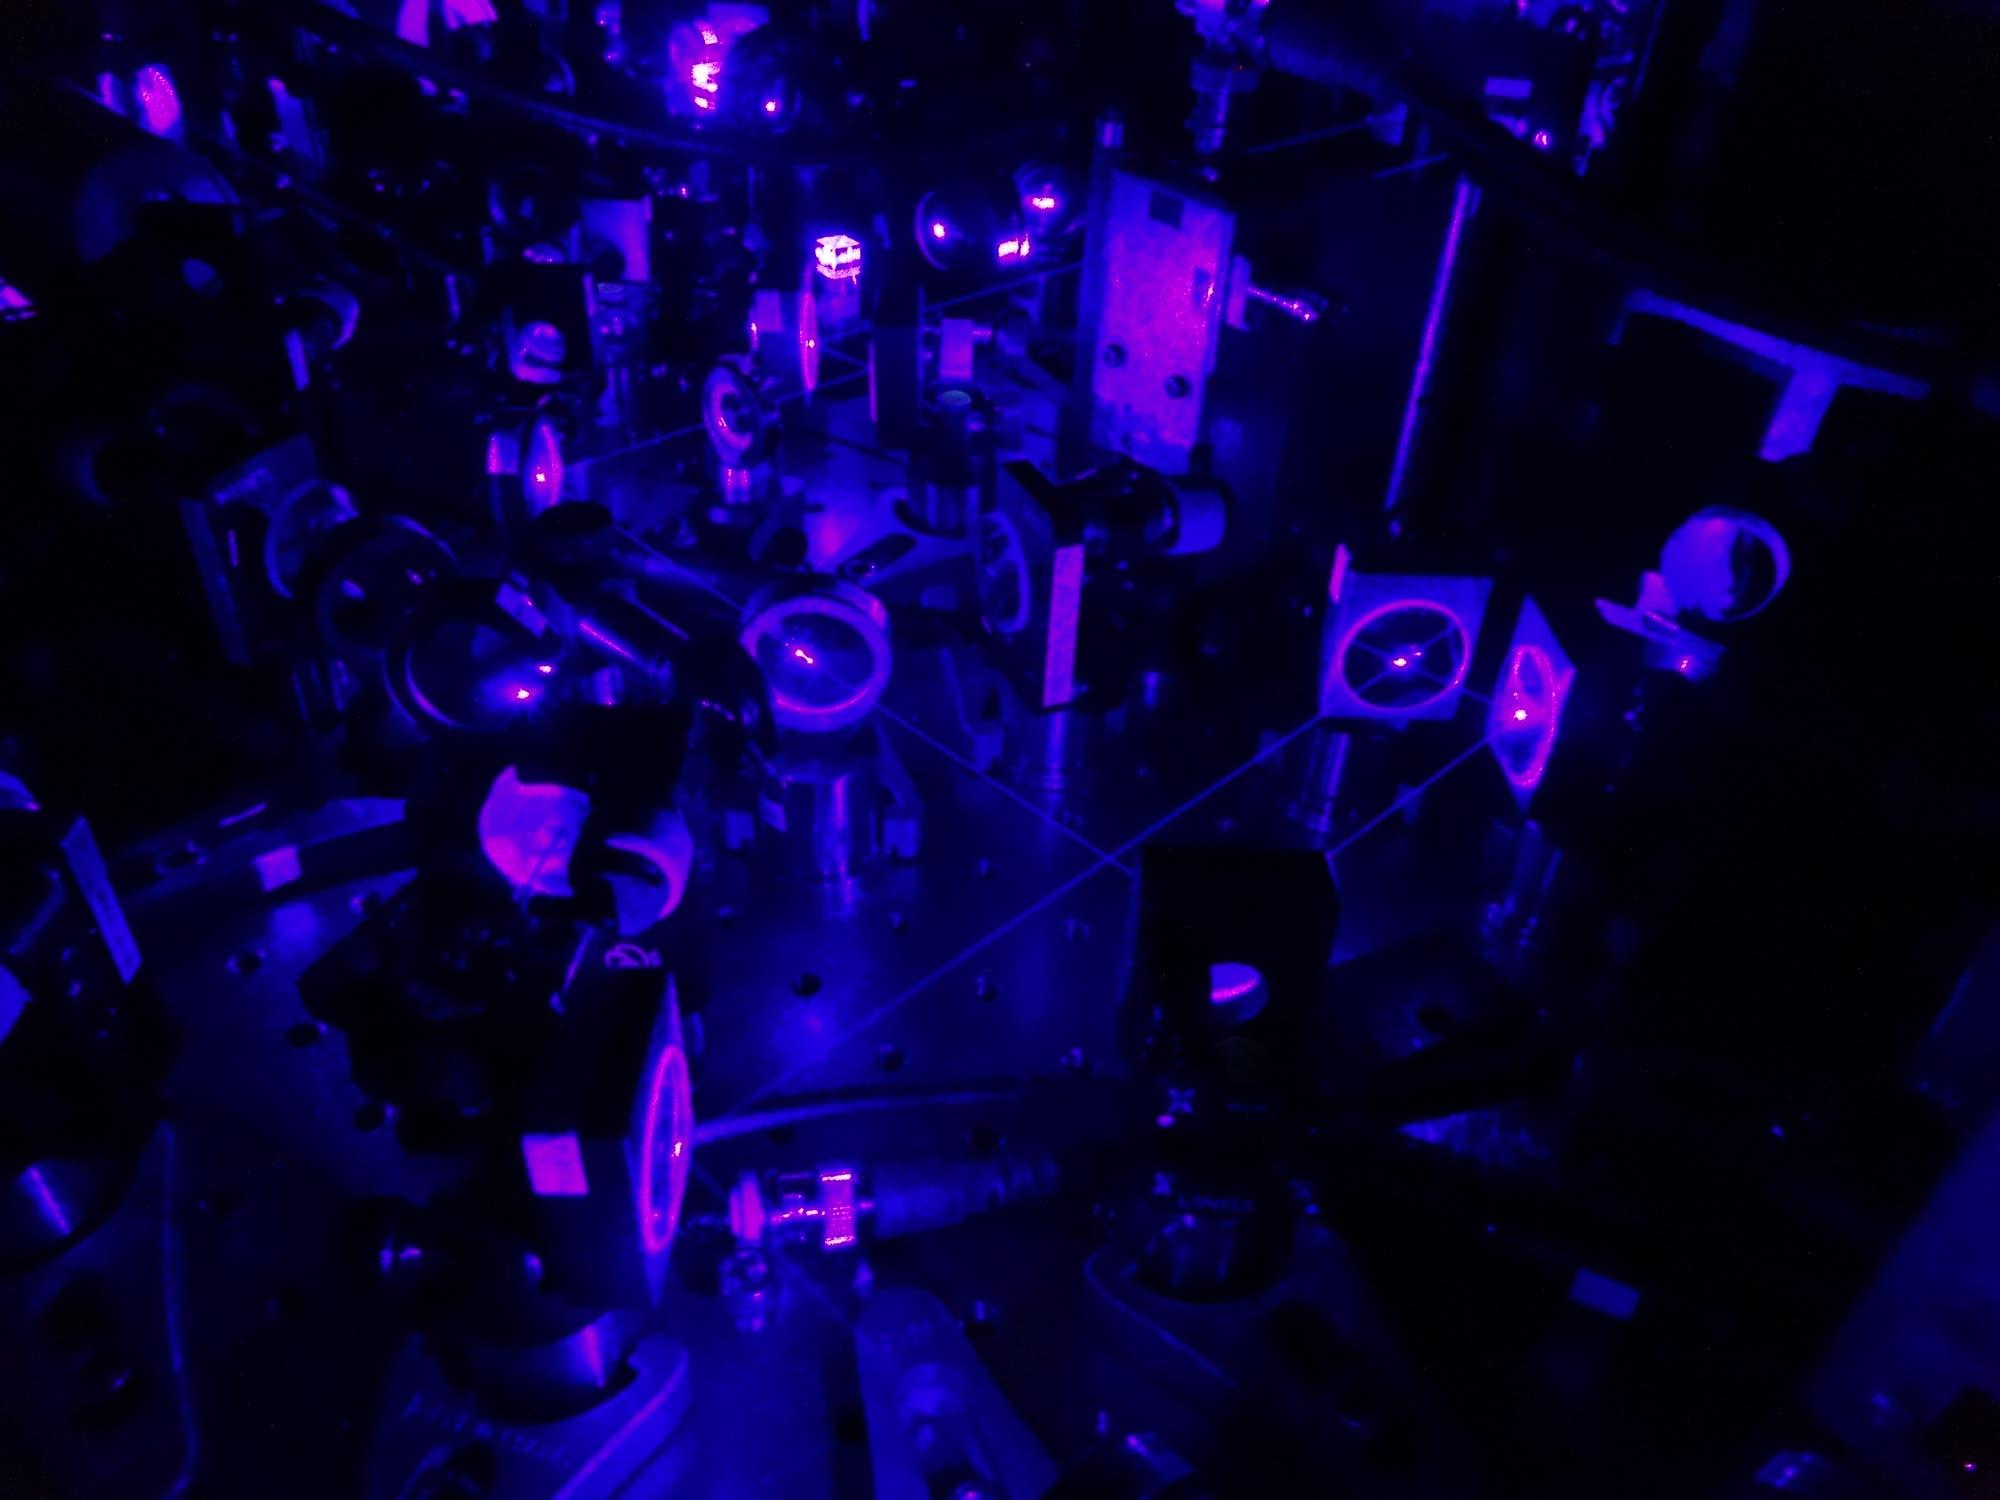 Messungen an einzelnen Photonen